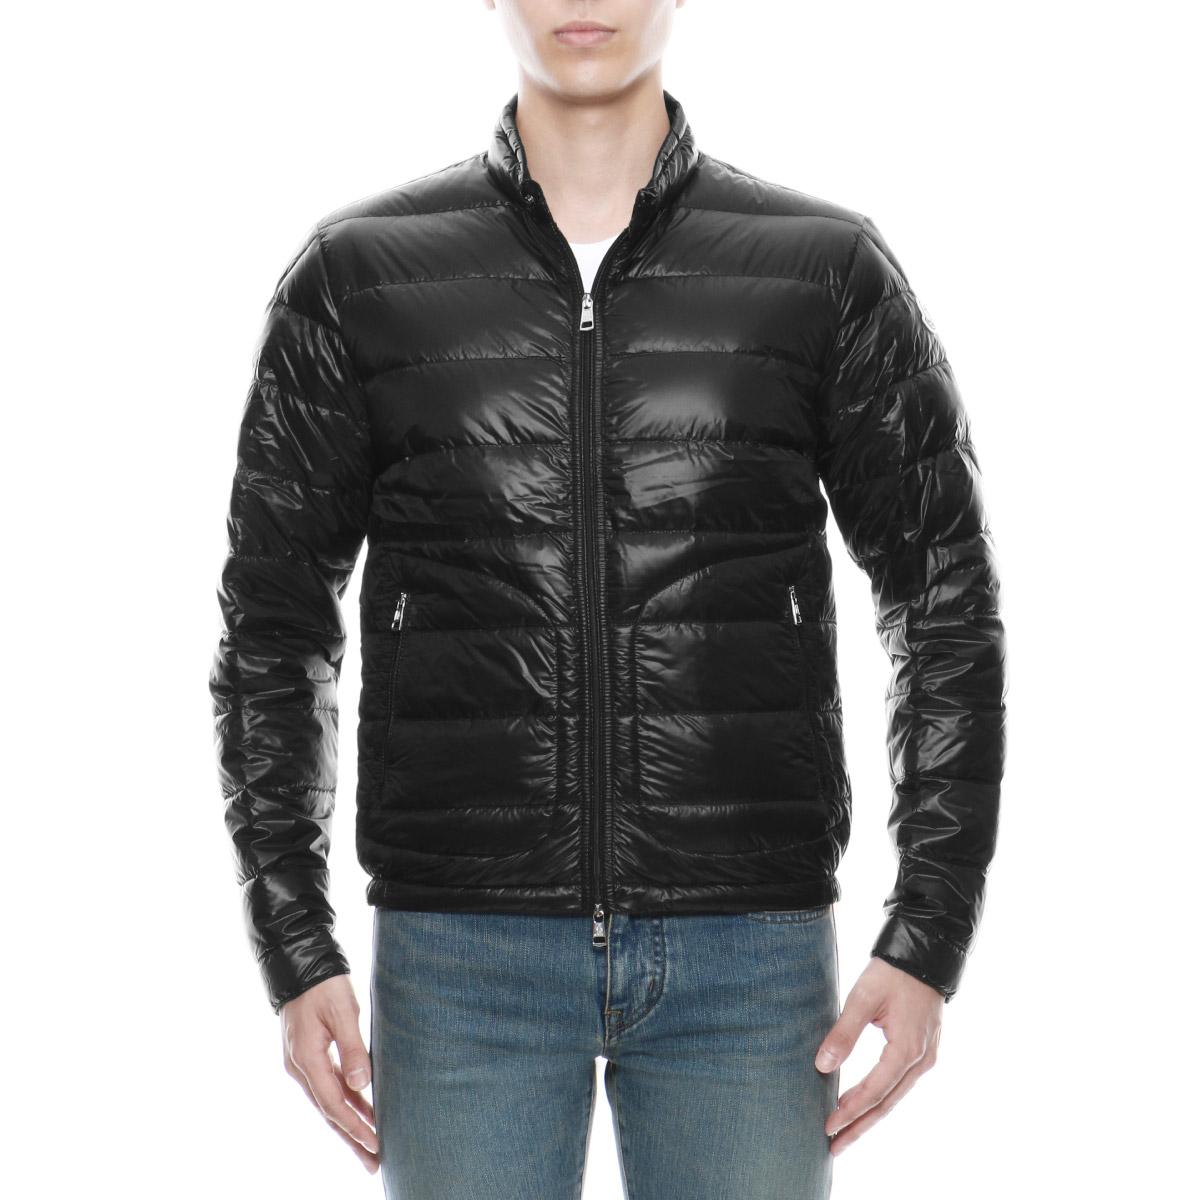 Monk rail MONCLER outer men ACORUS 53029 999 down jacket ACORUS アコルス BLACK black